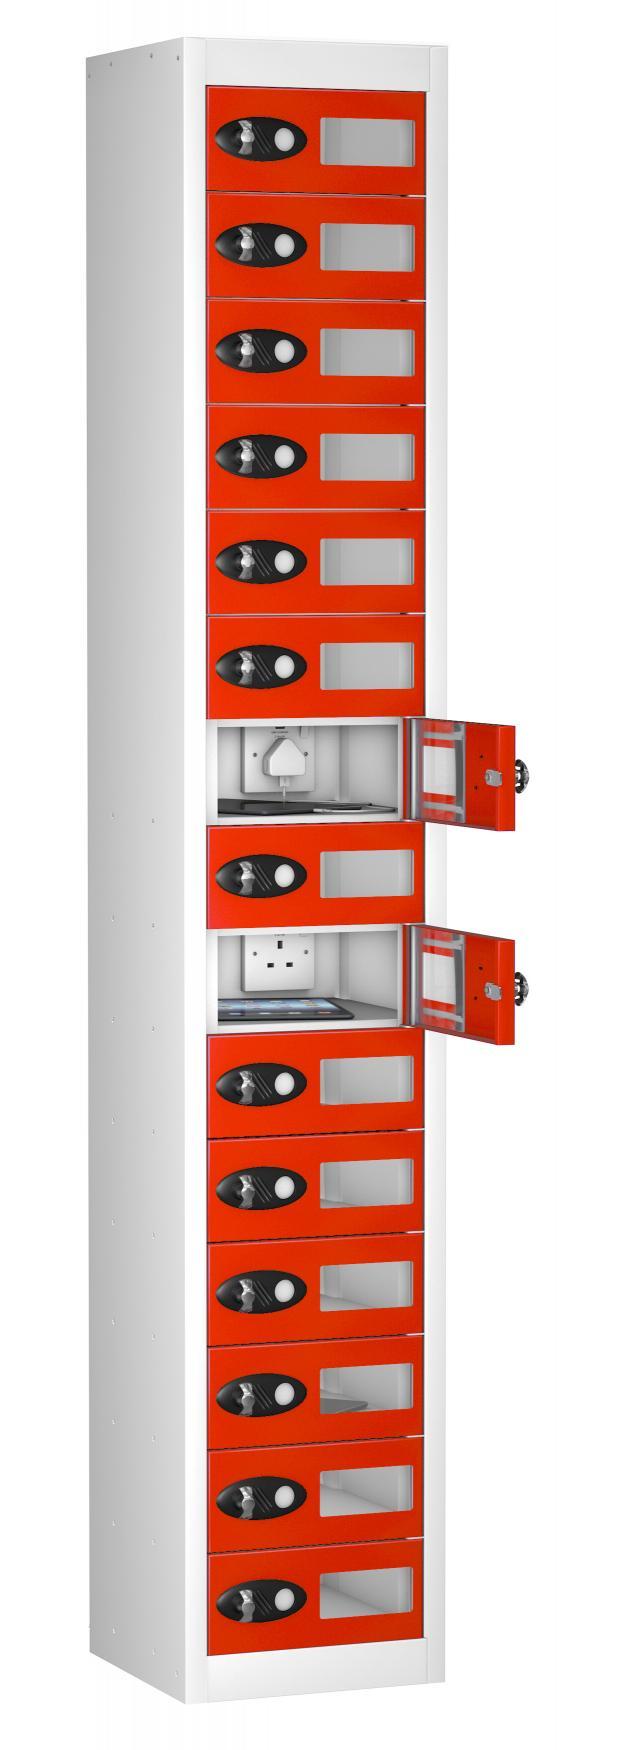 School Vision Panel 15 Door TABLET Charging Locker